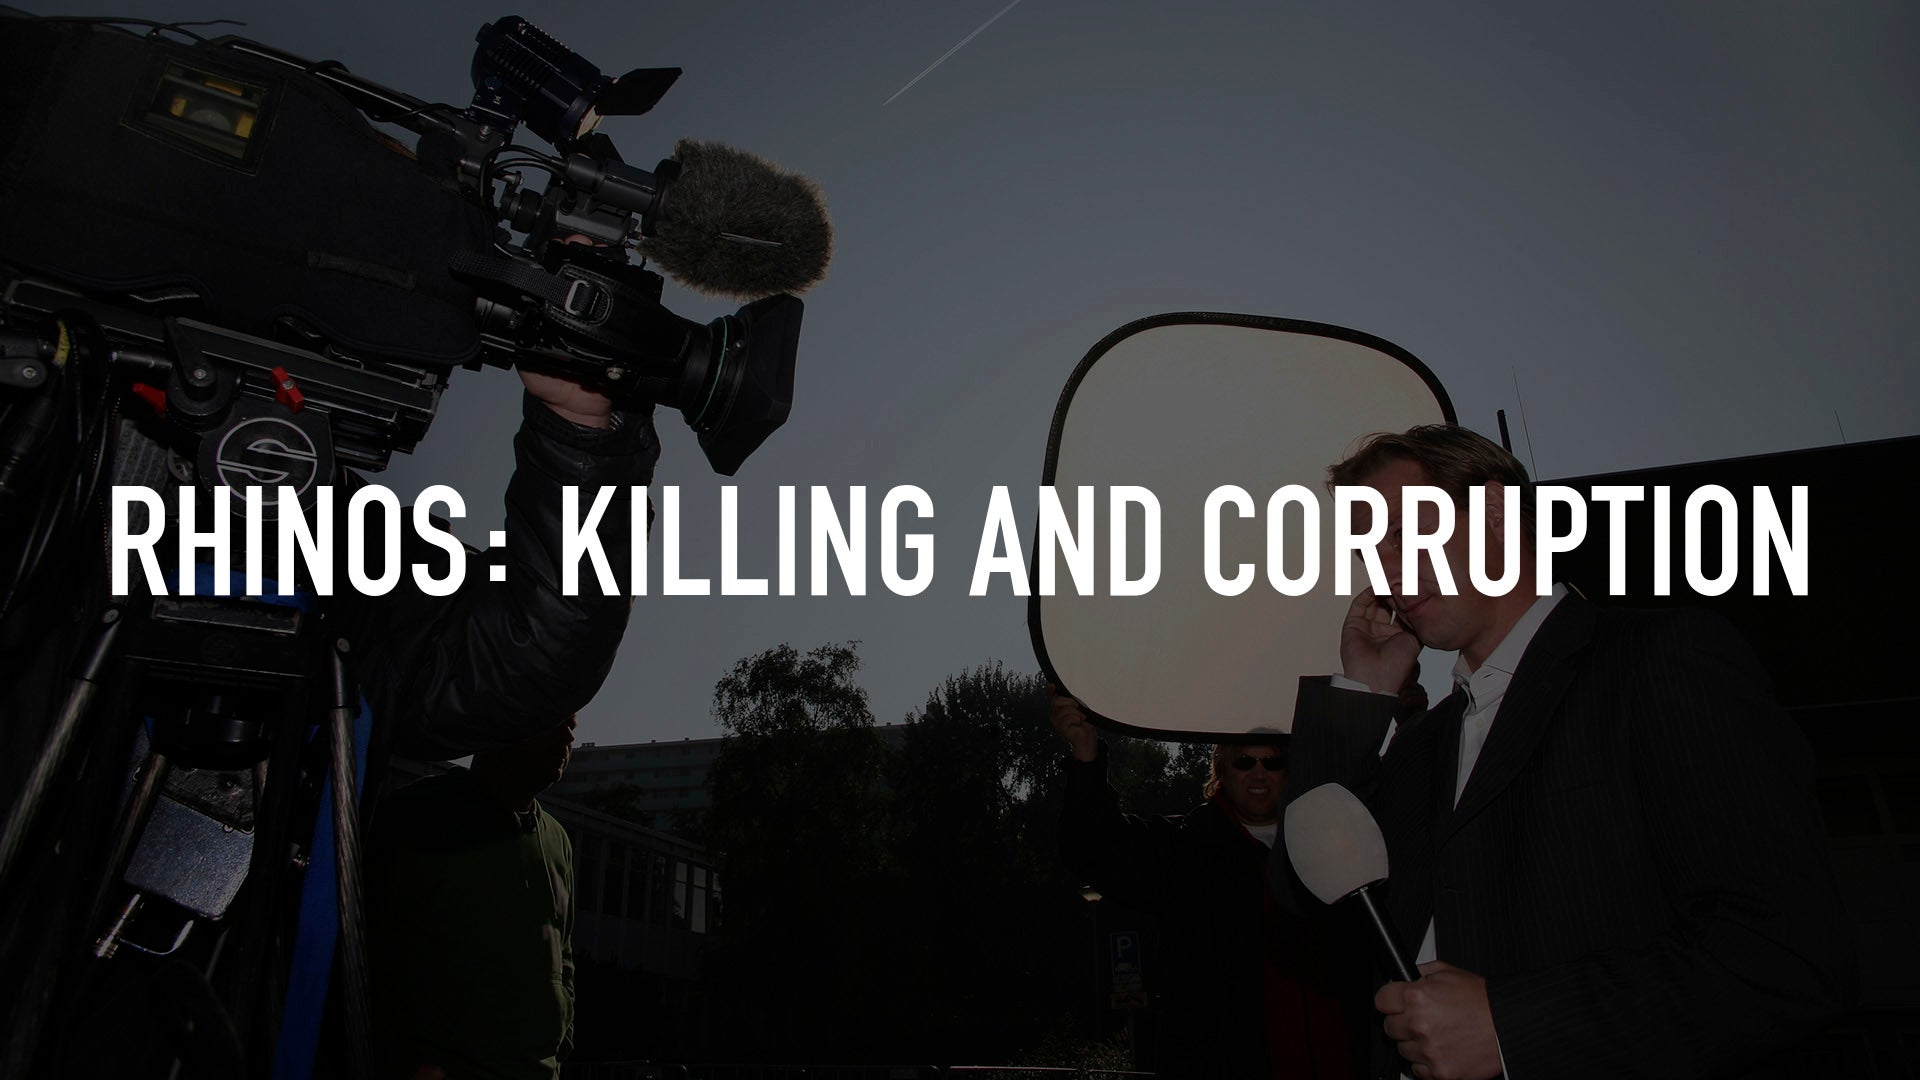 Rhinos: Killing And Corruption